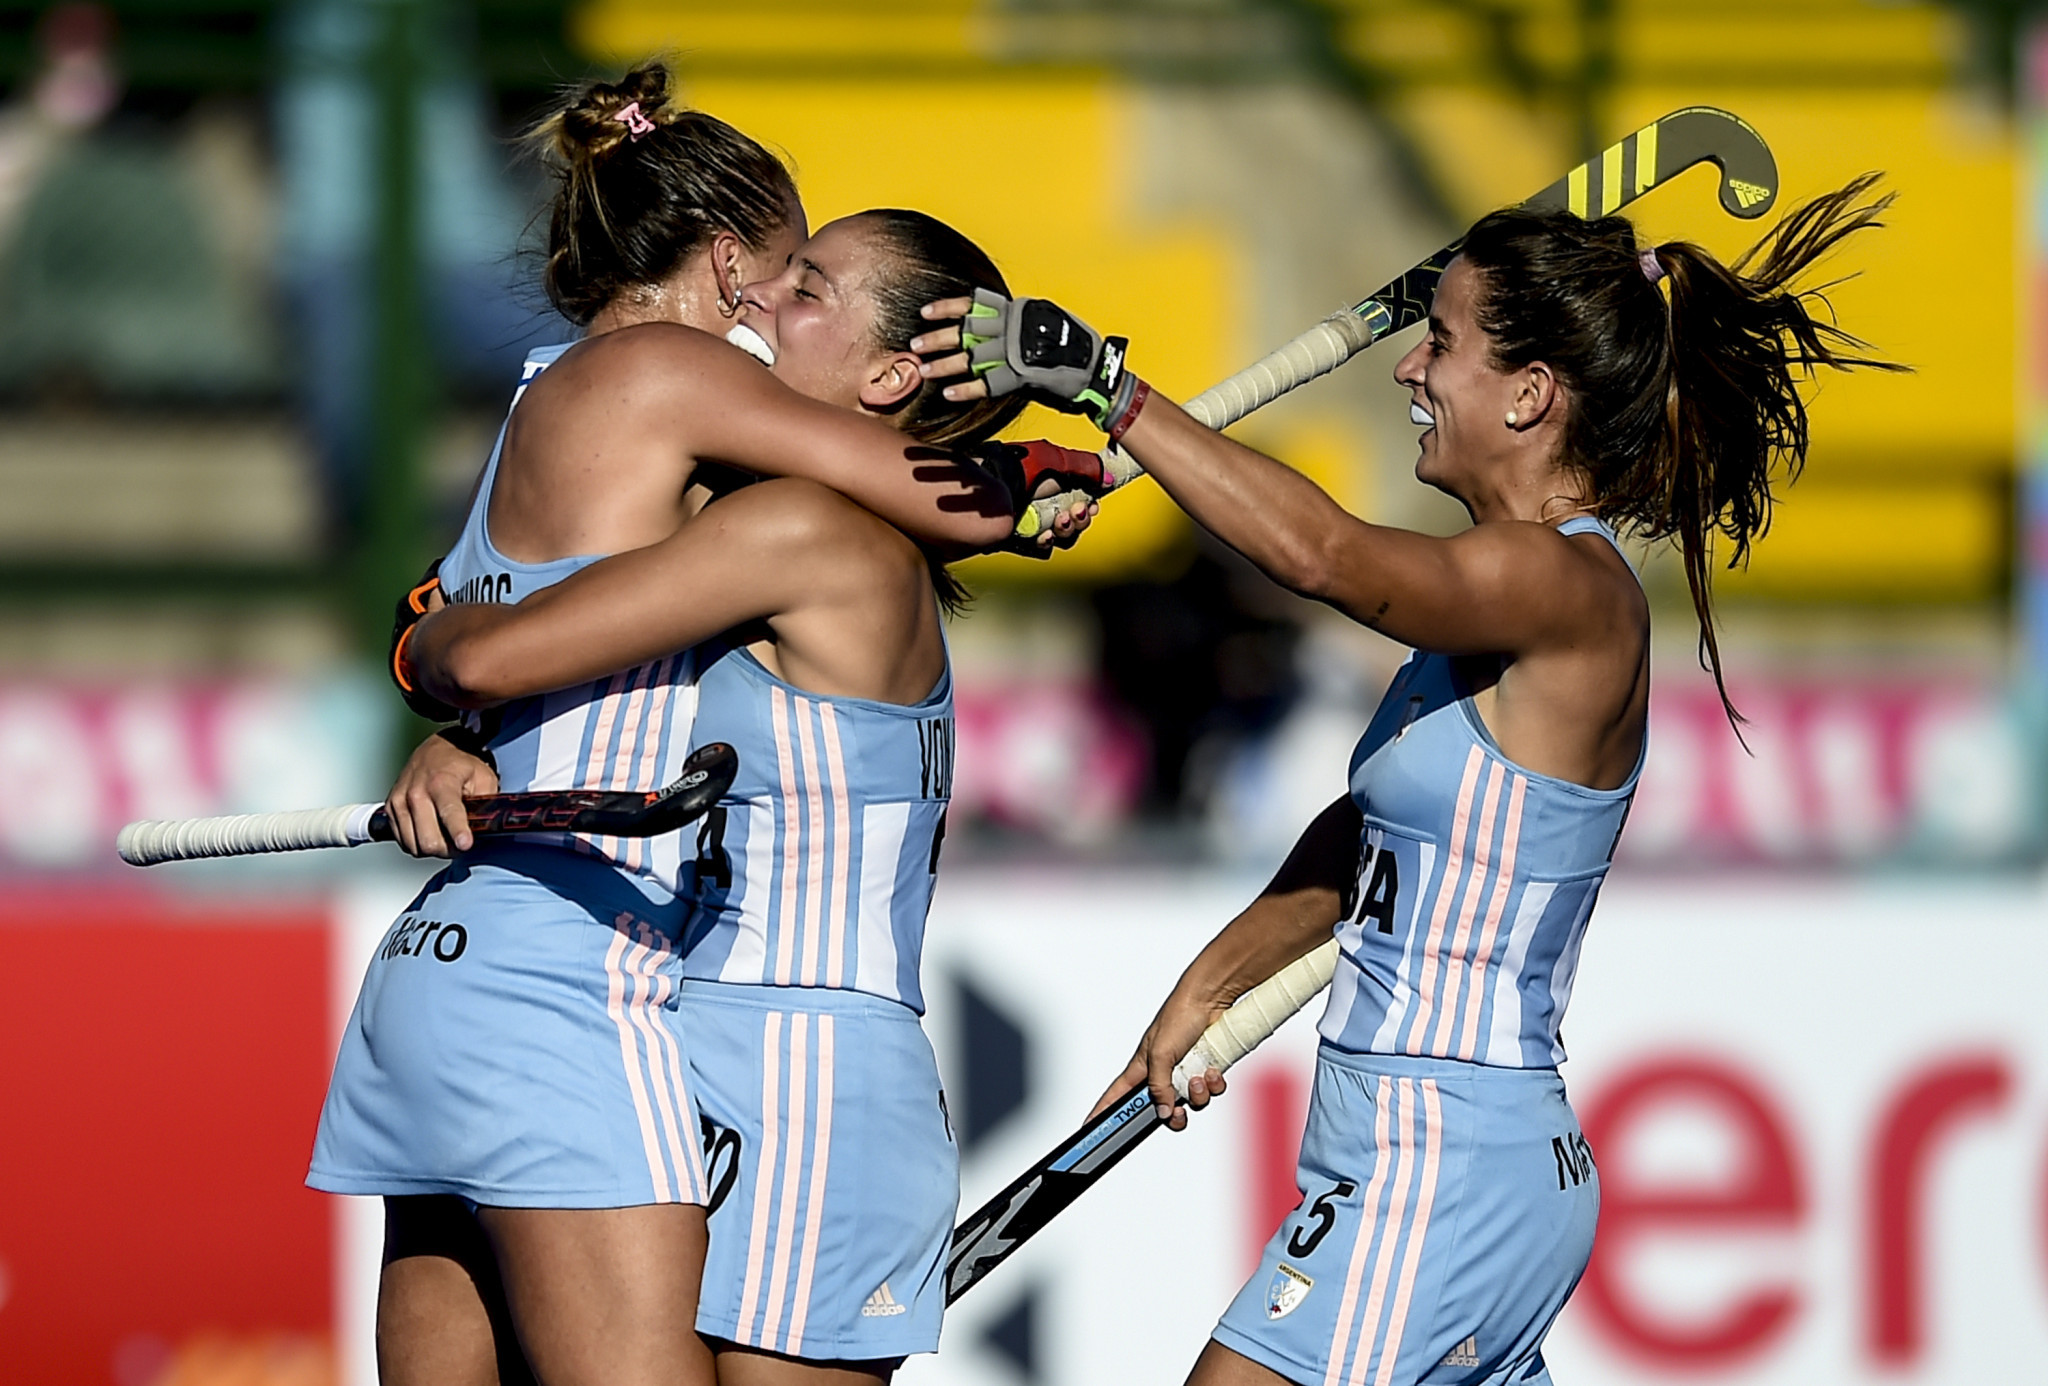 Argentina continue winning streak in FIH Pro League